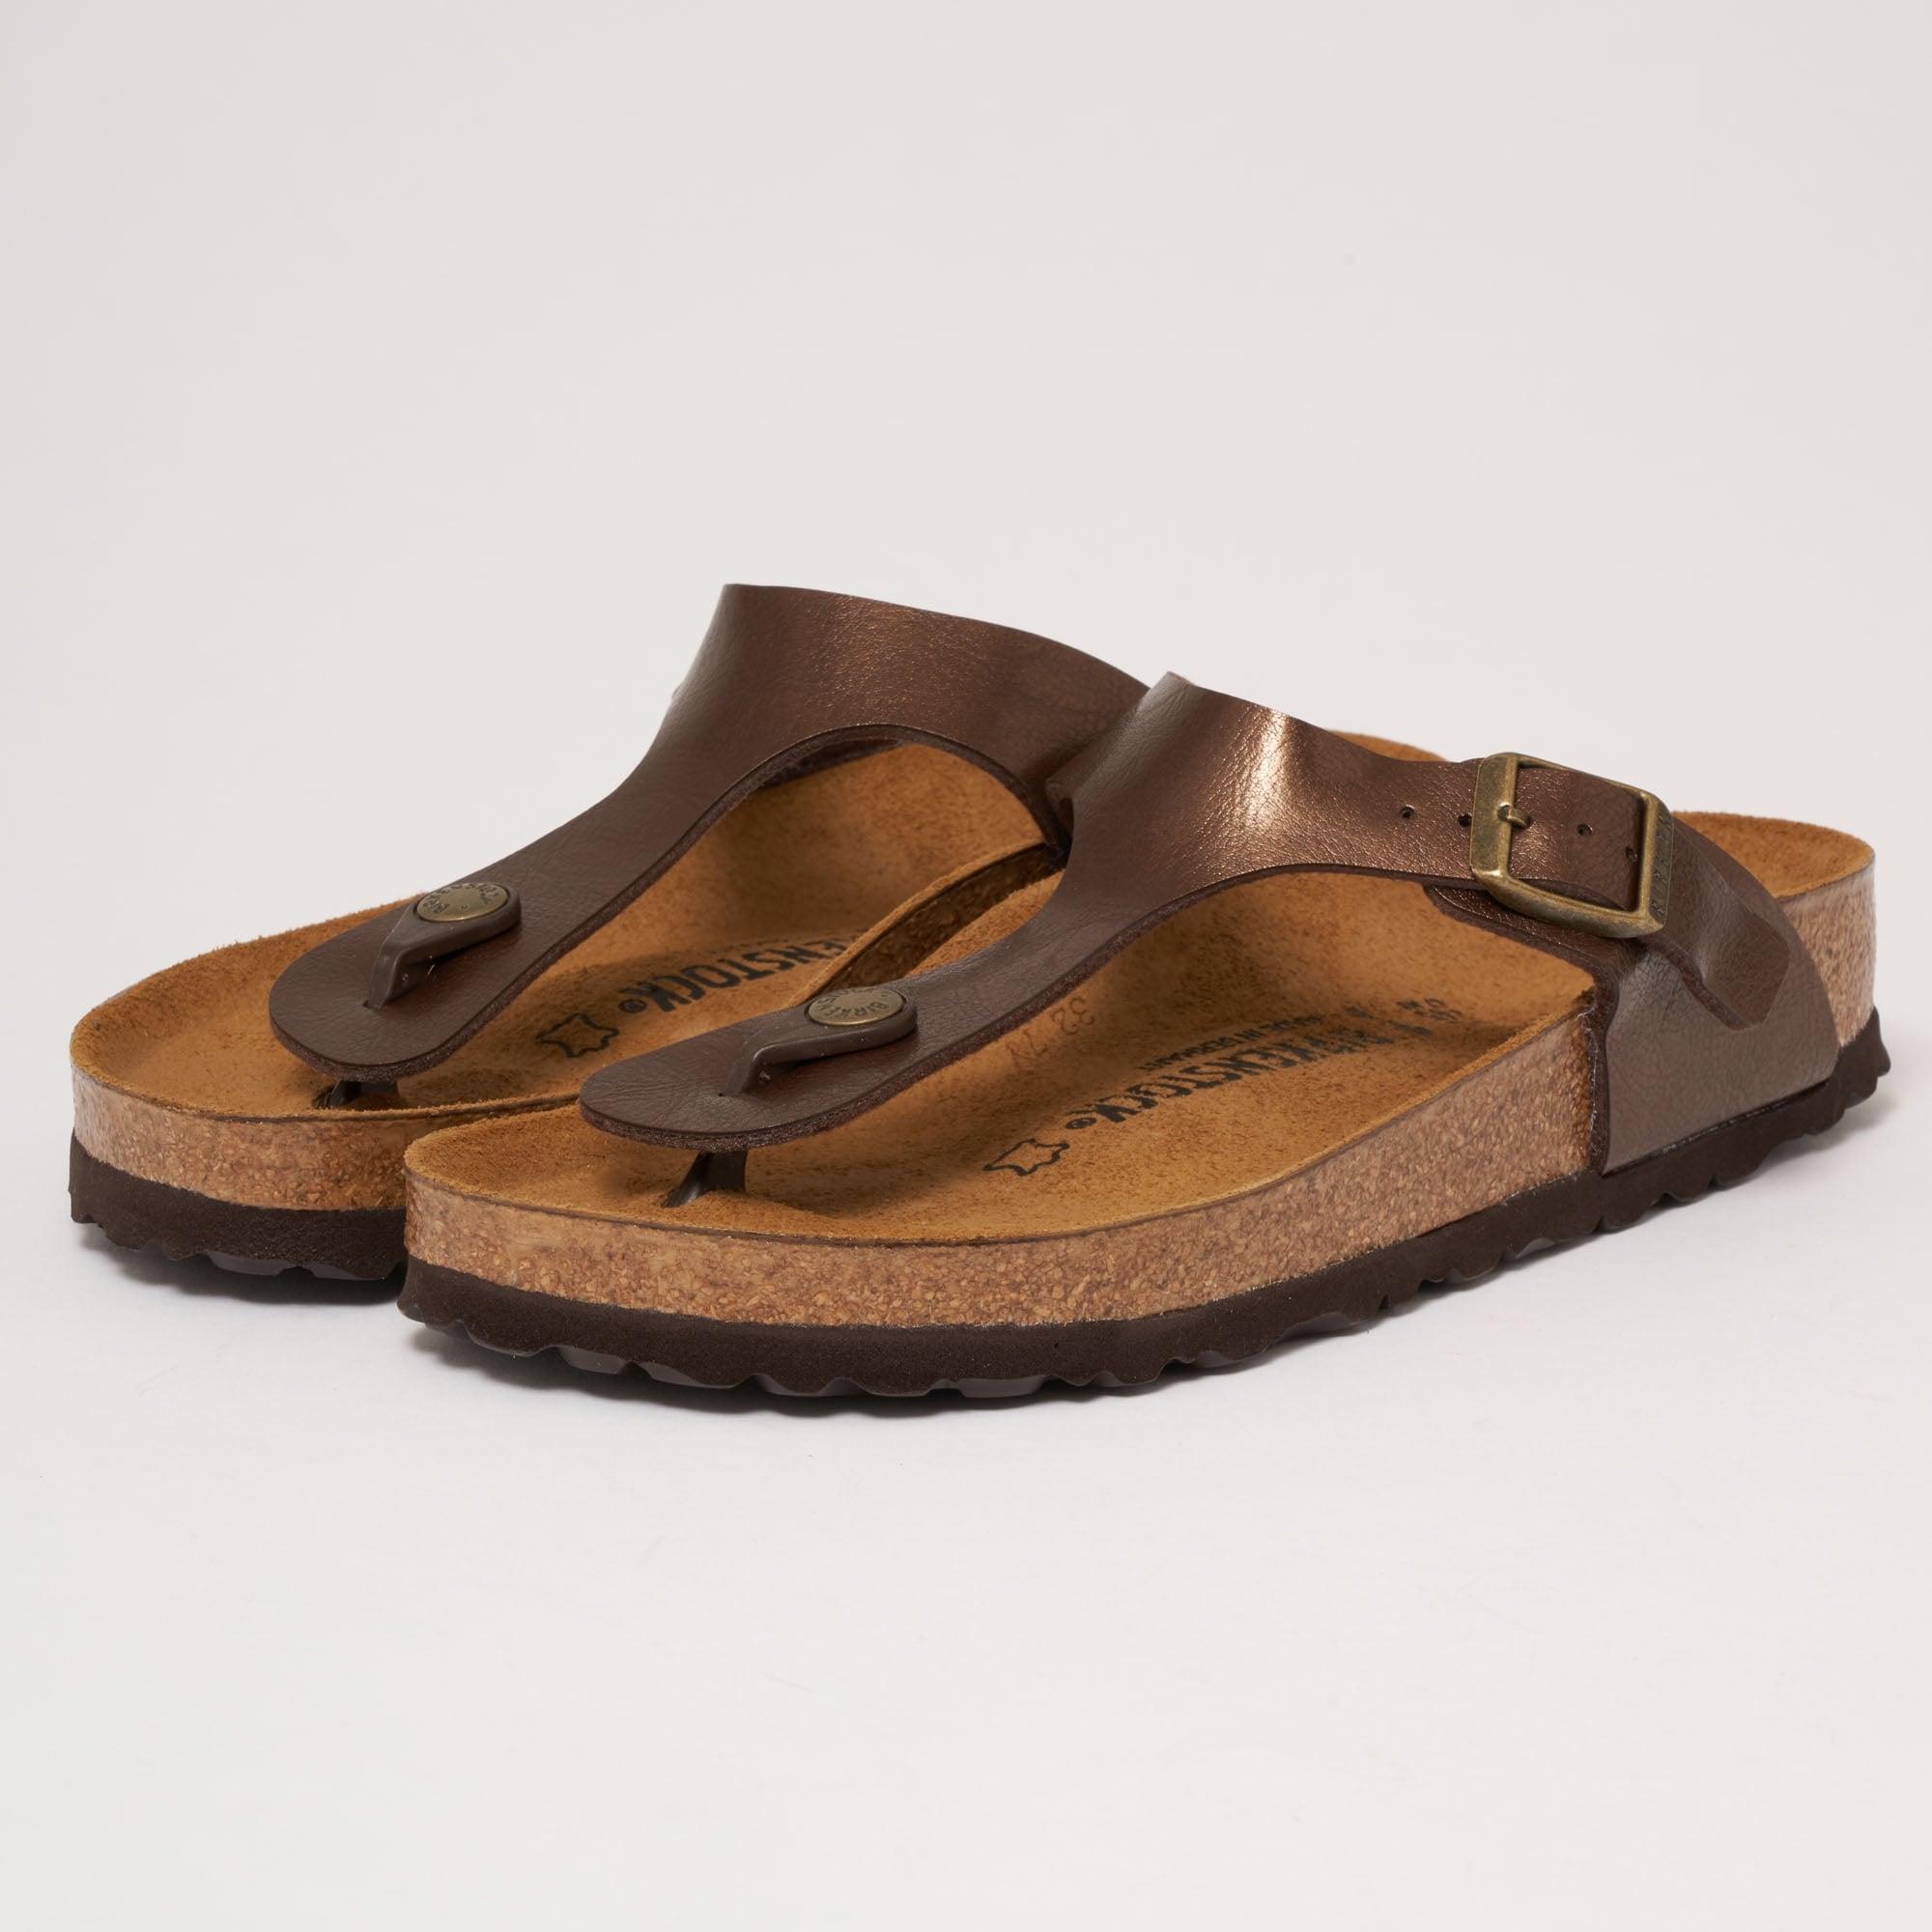 40fc4adba Birkenstock Womens Gizeh Sandals